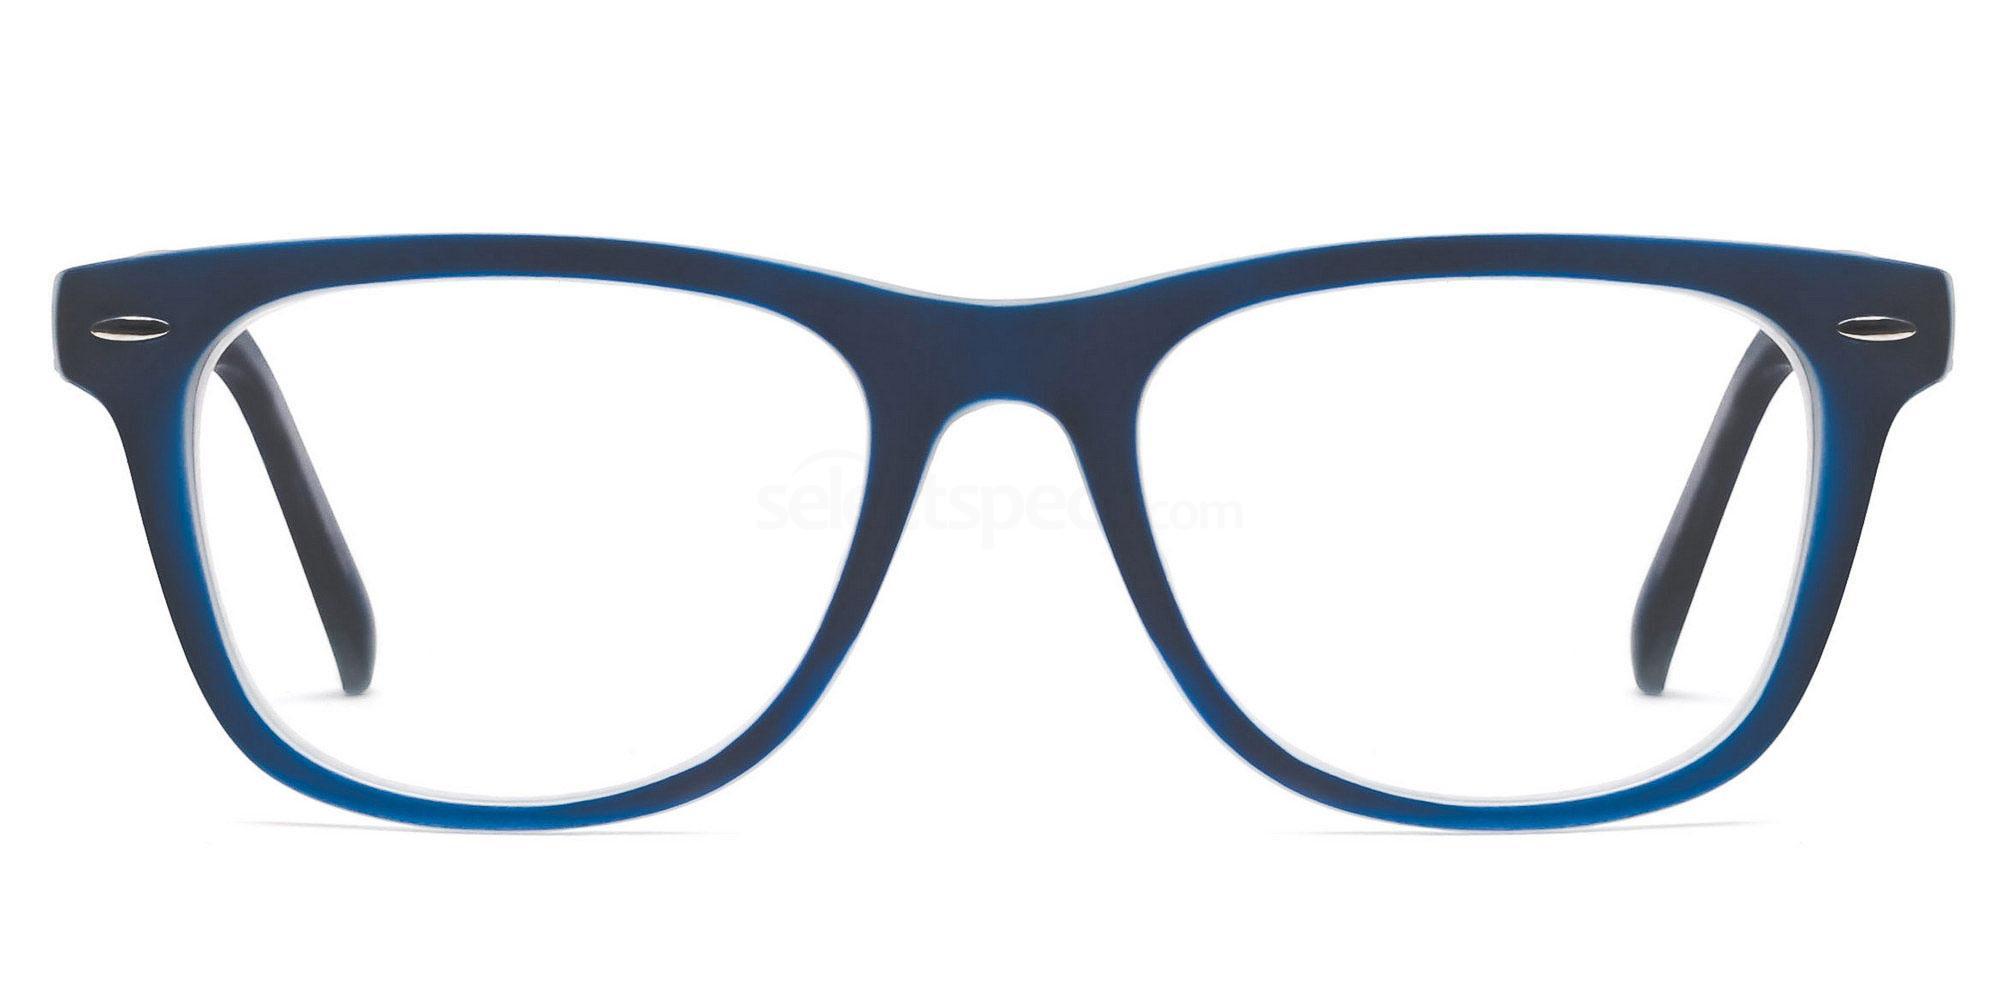 C14 8121 - Navy on Transparent Glasses, SelectSpecs